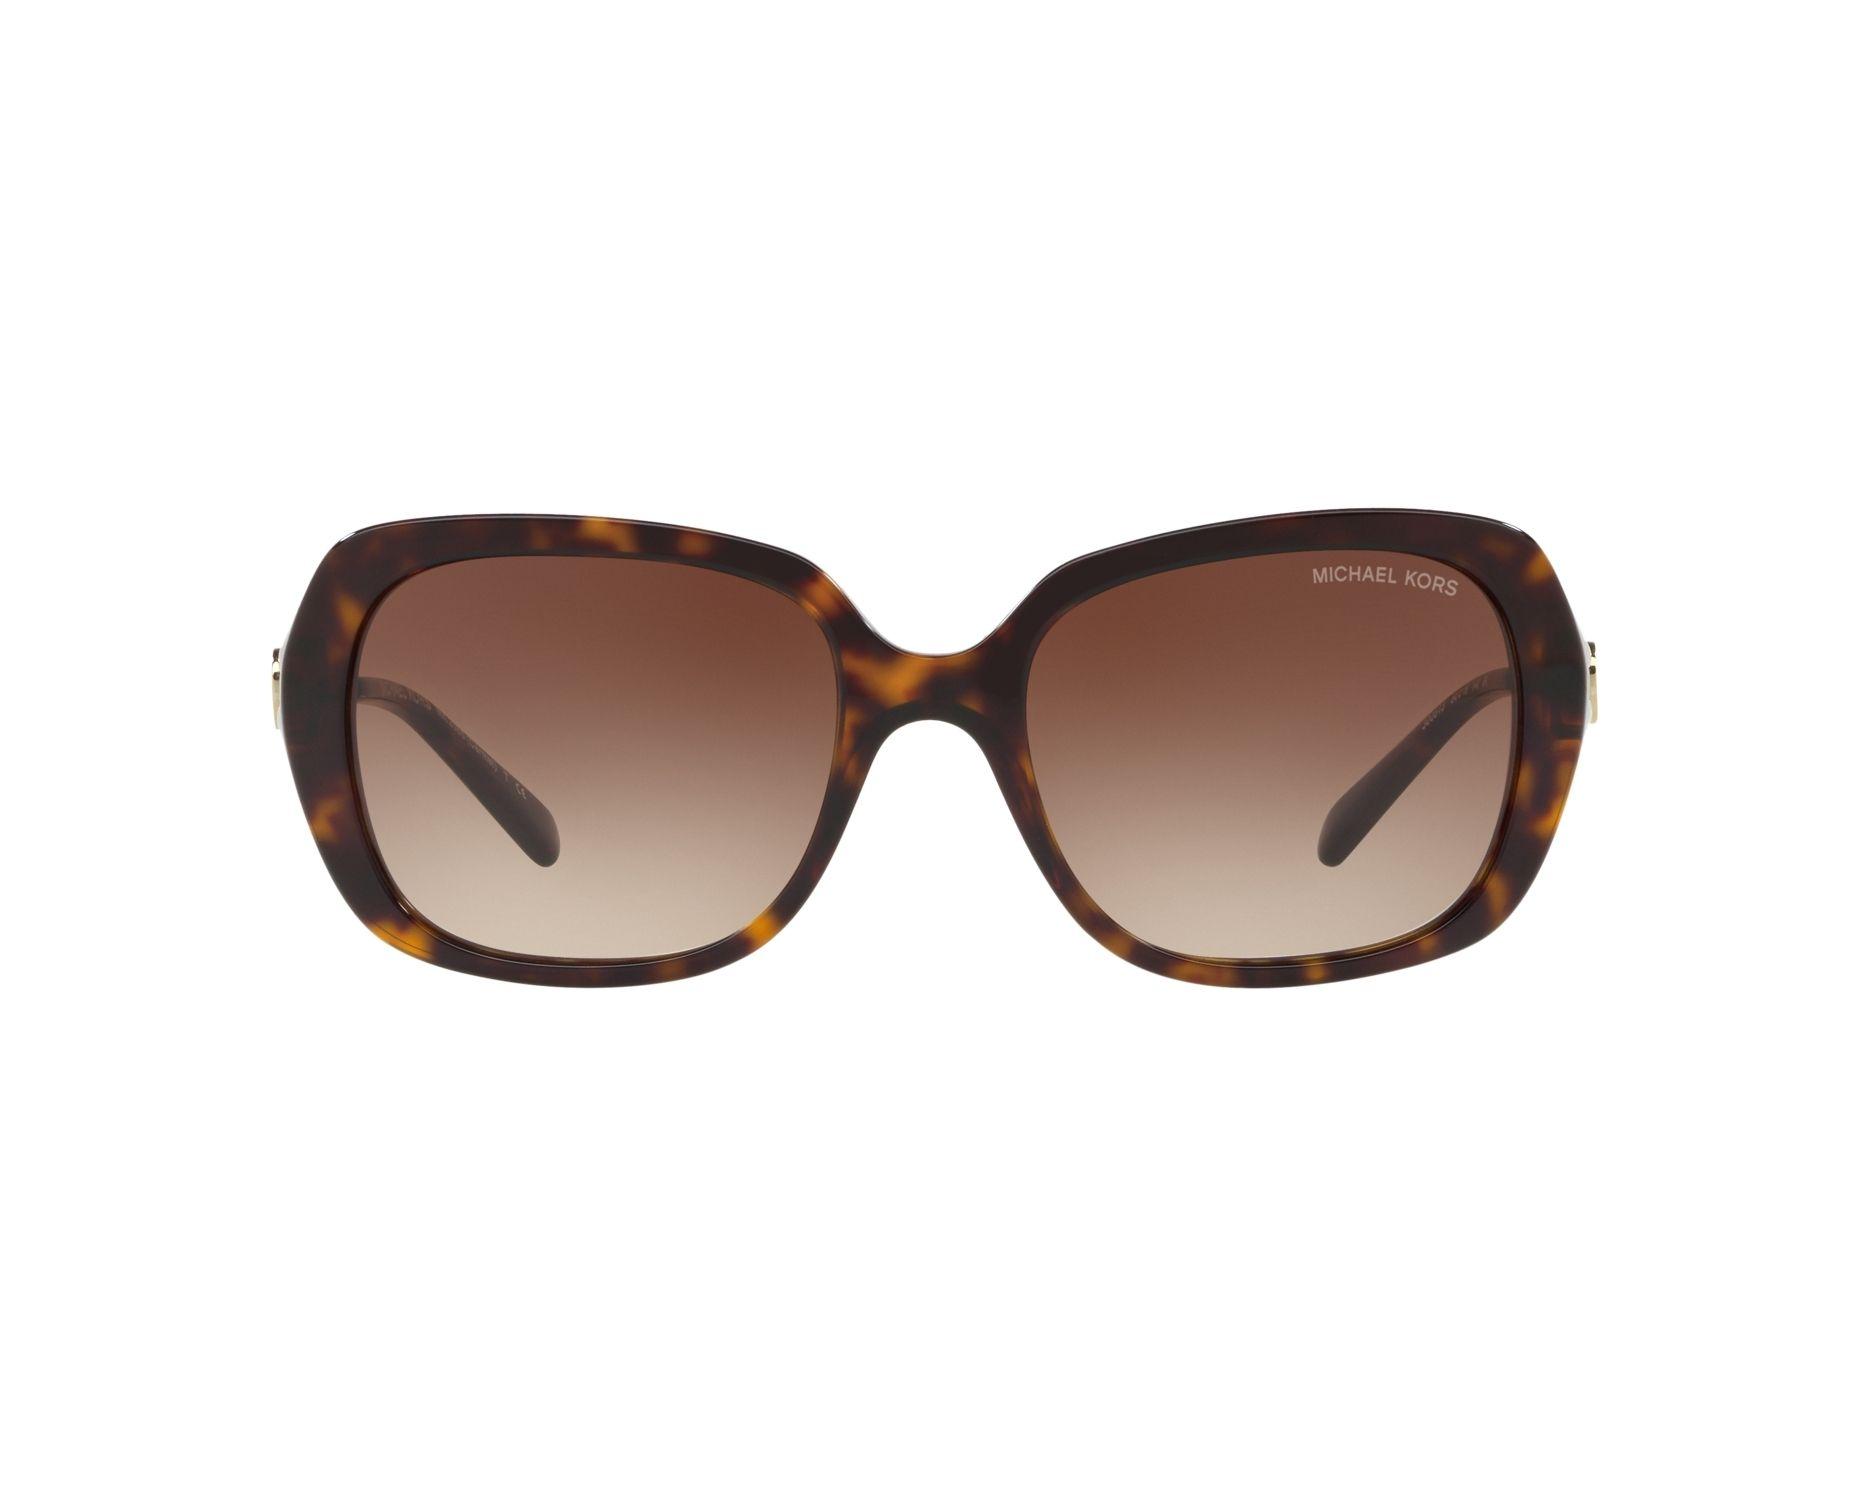 59b2819c87d8 Sunglasses Michael Kors MK-2065 300613 54-18 Havana Gold 360 degree view 1